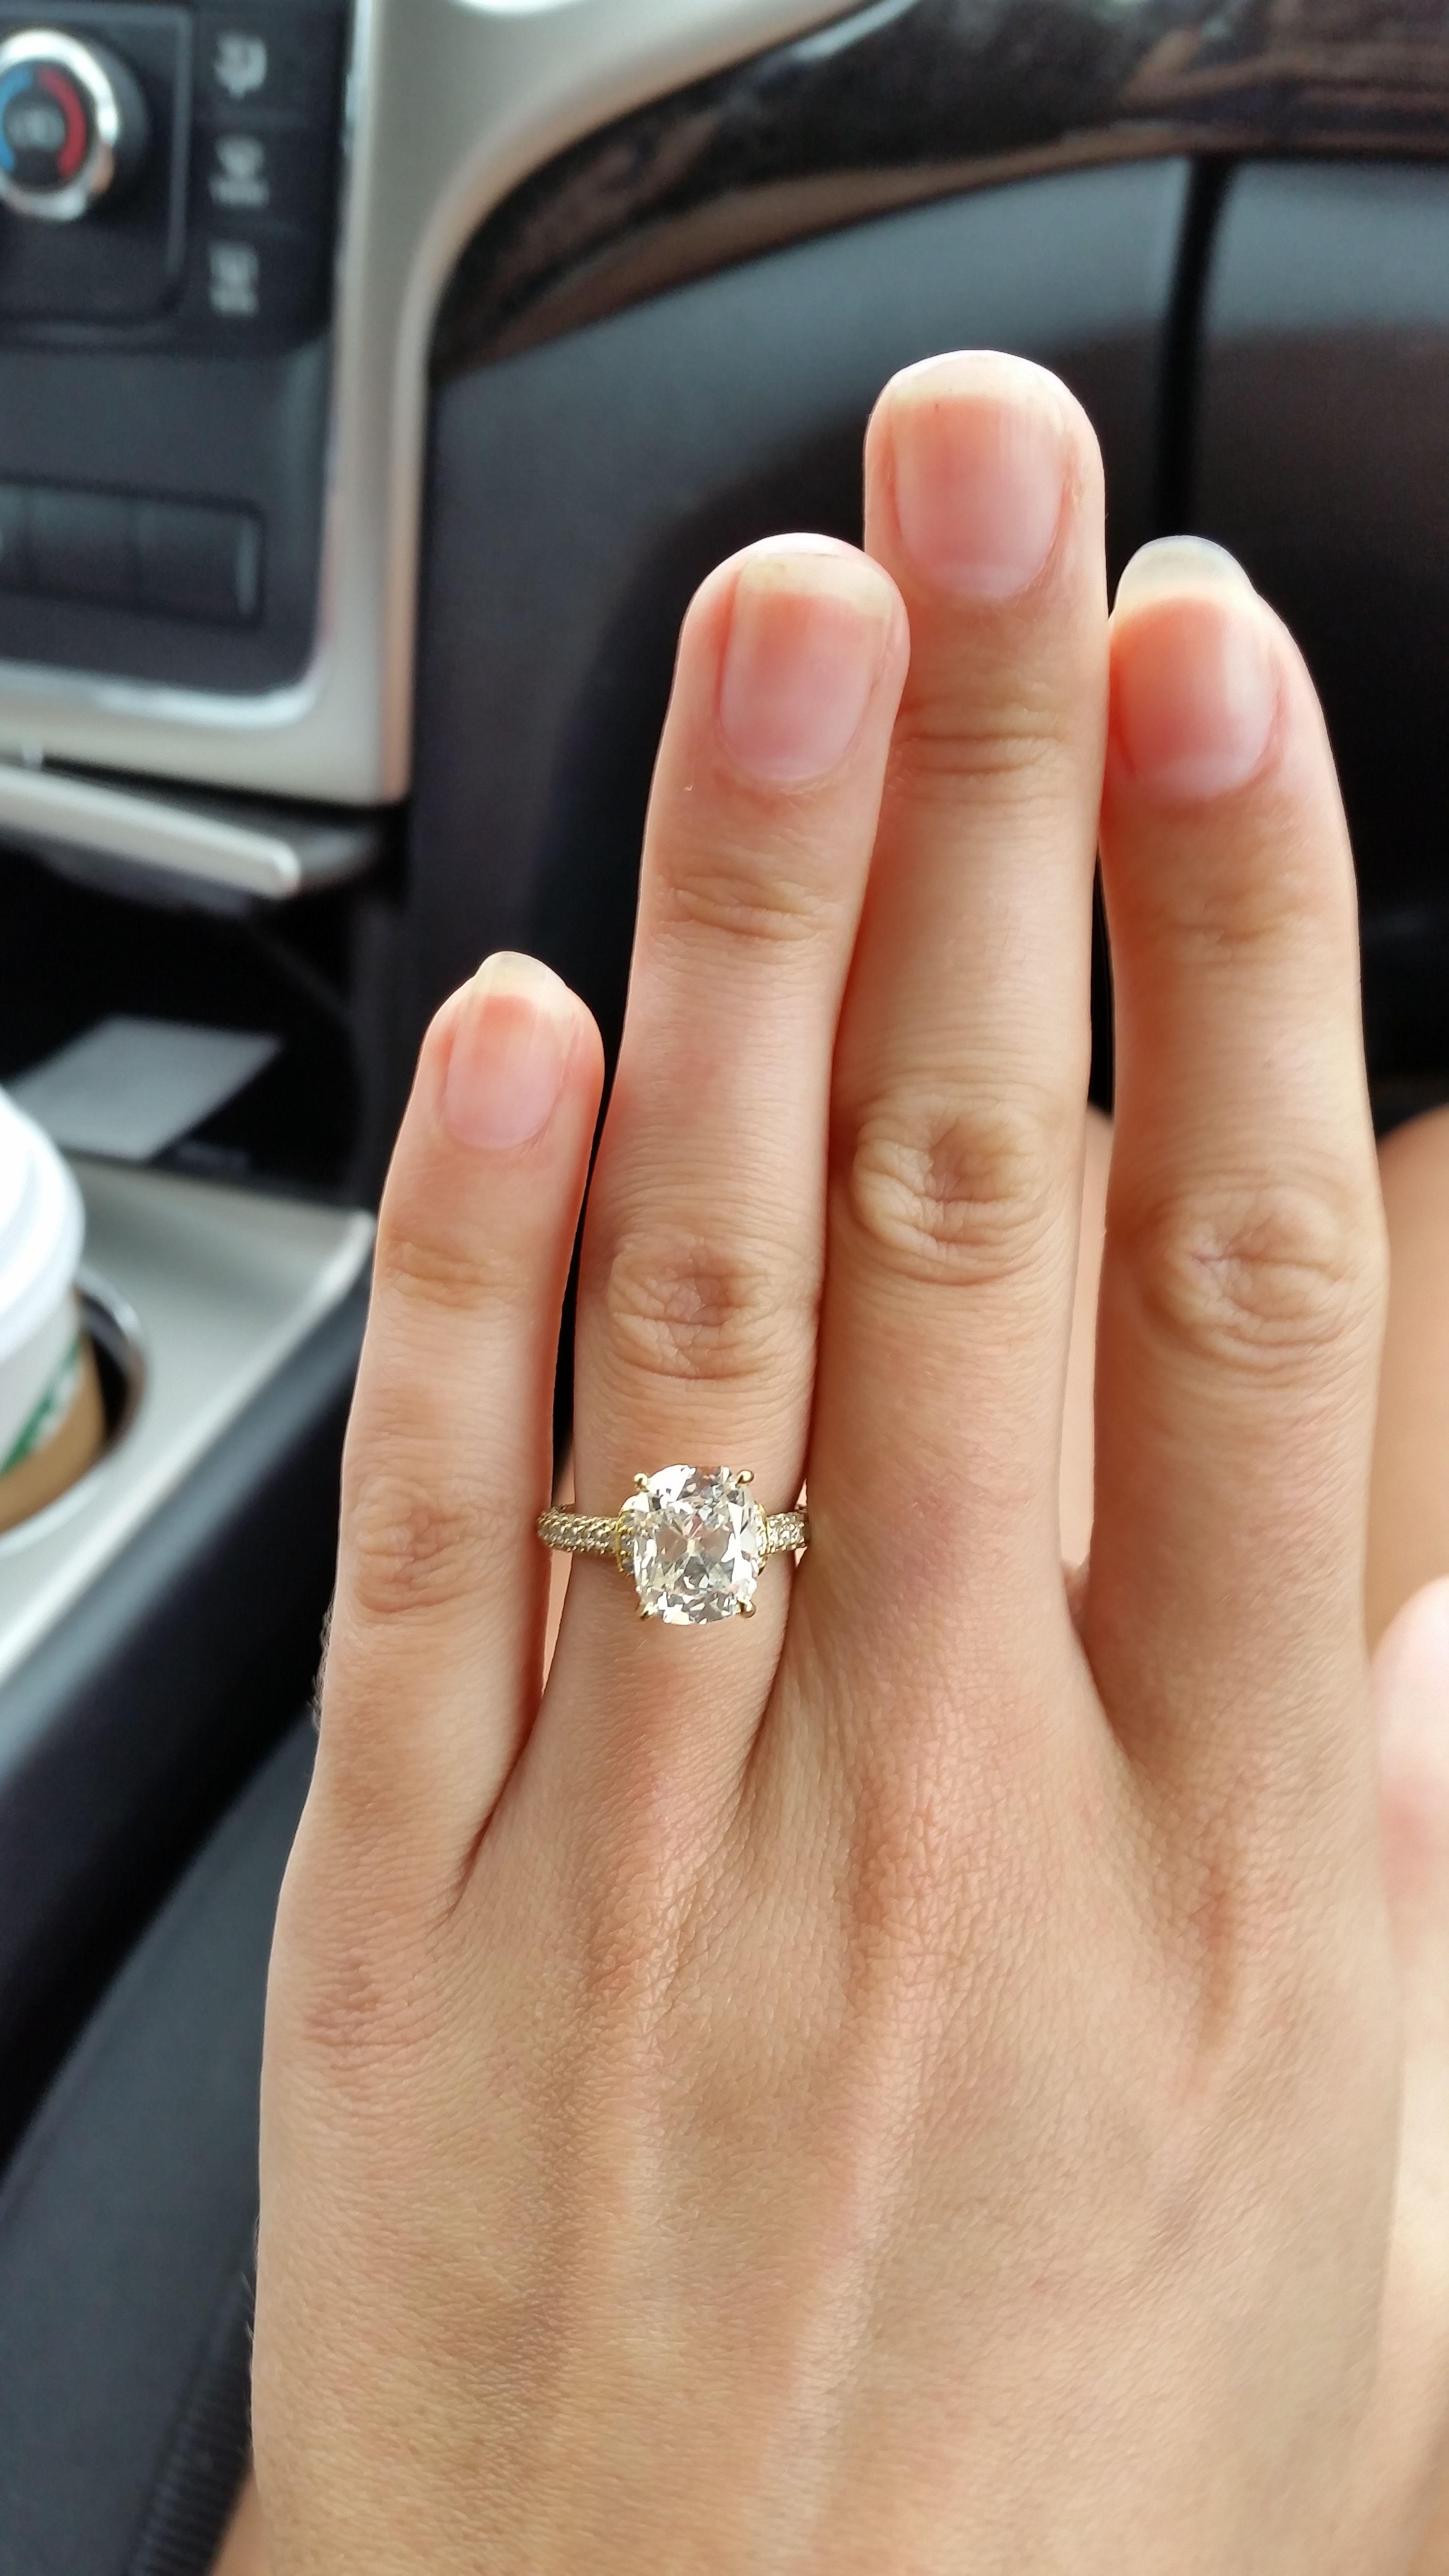 Show Me Your 2 5 Or 3 Carat Cushion Cut Diamond Weddingbee